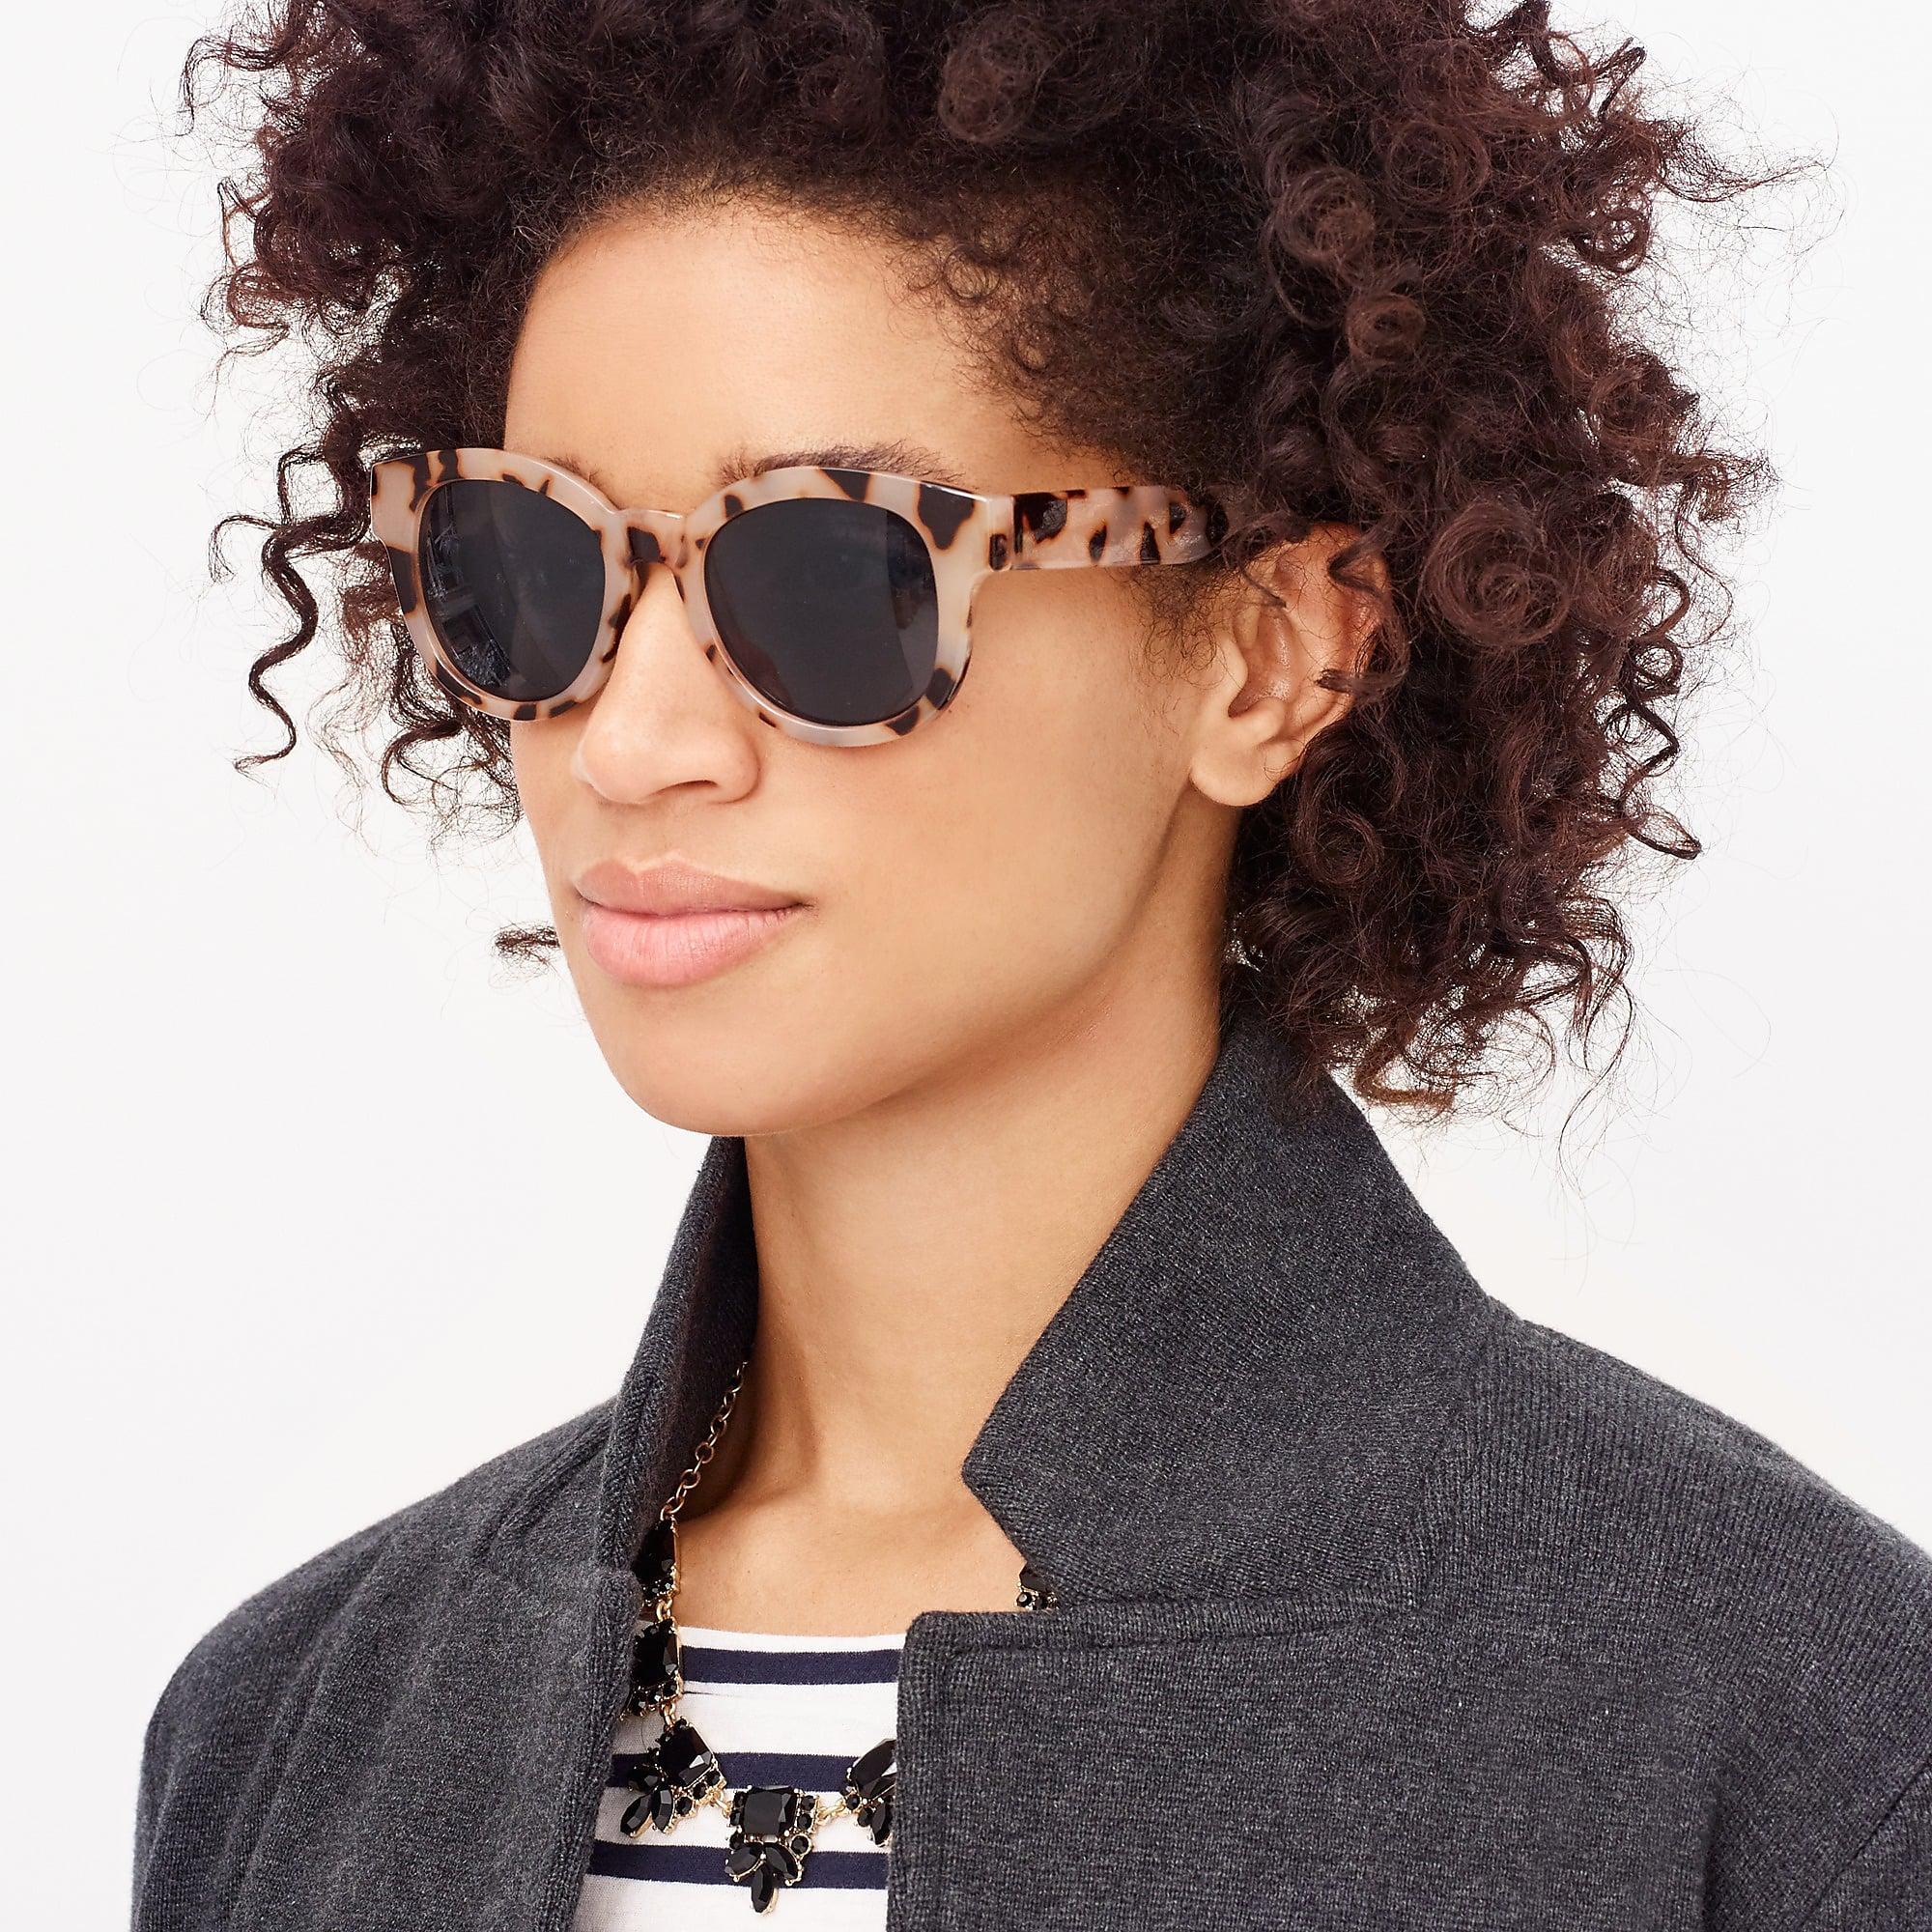 d630428cc1 J.Crew Colorblock Sunglasses - Lyst